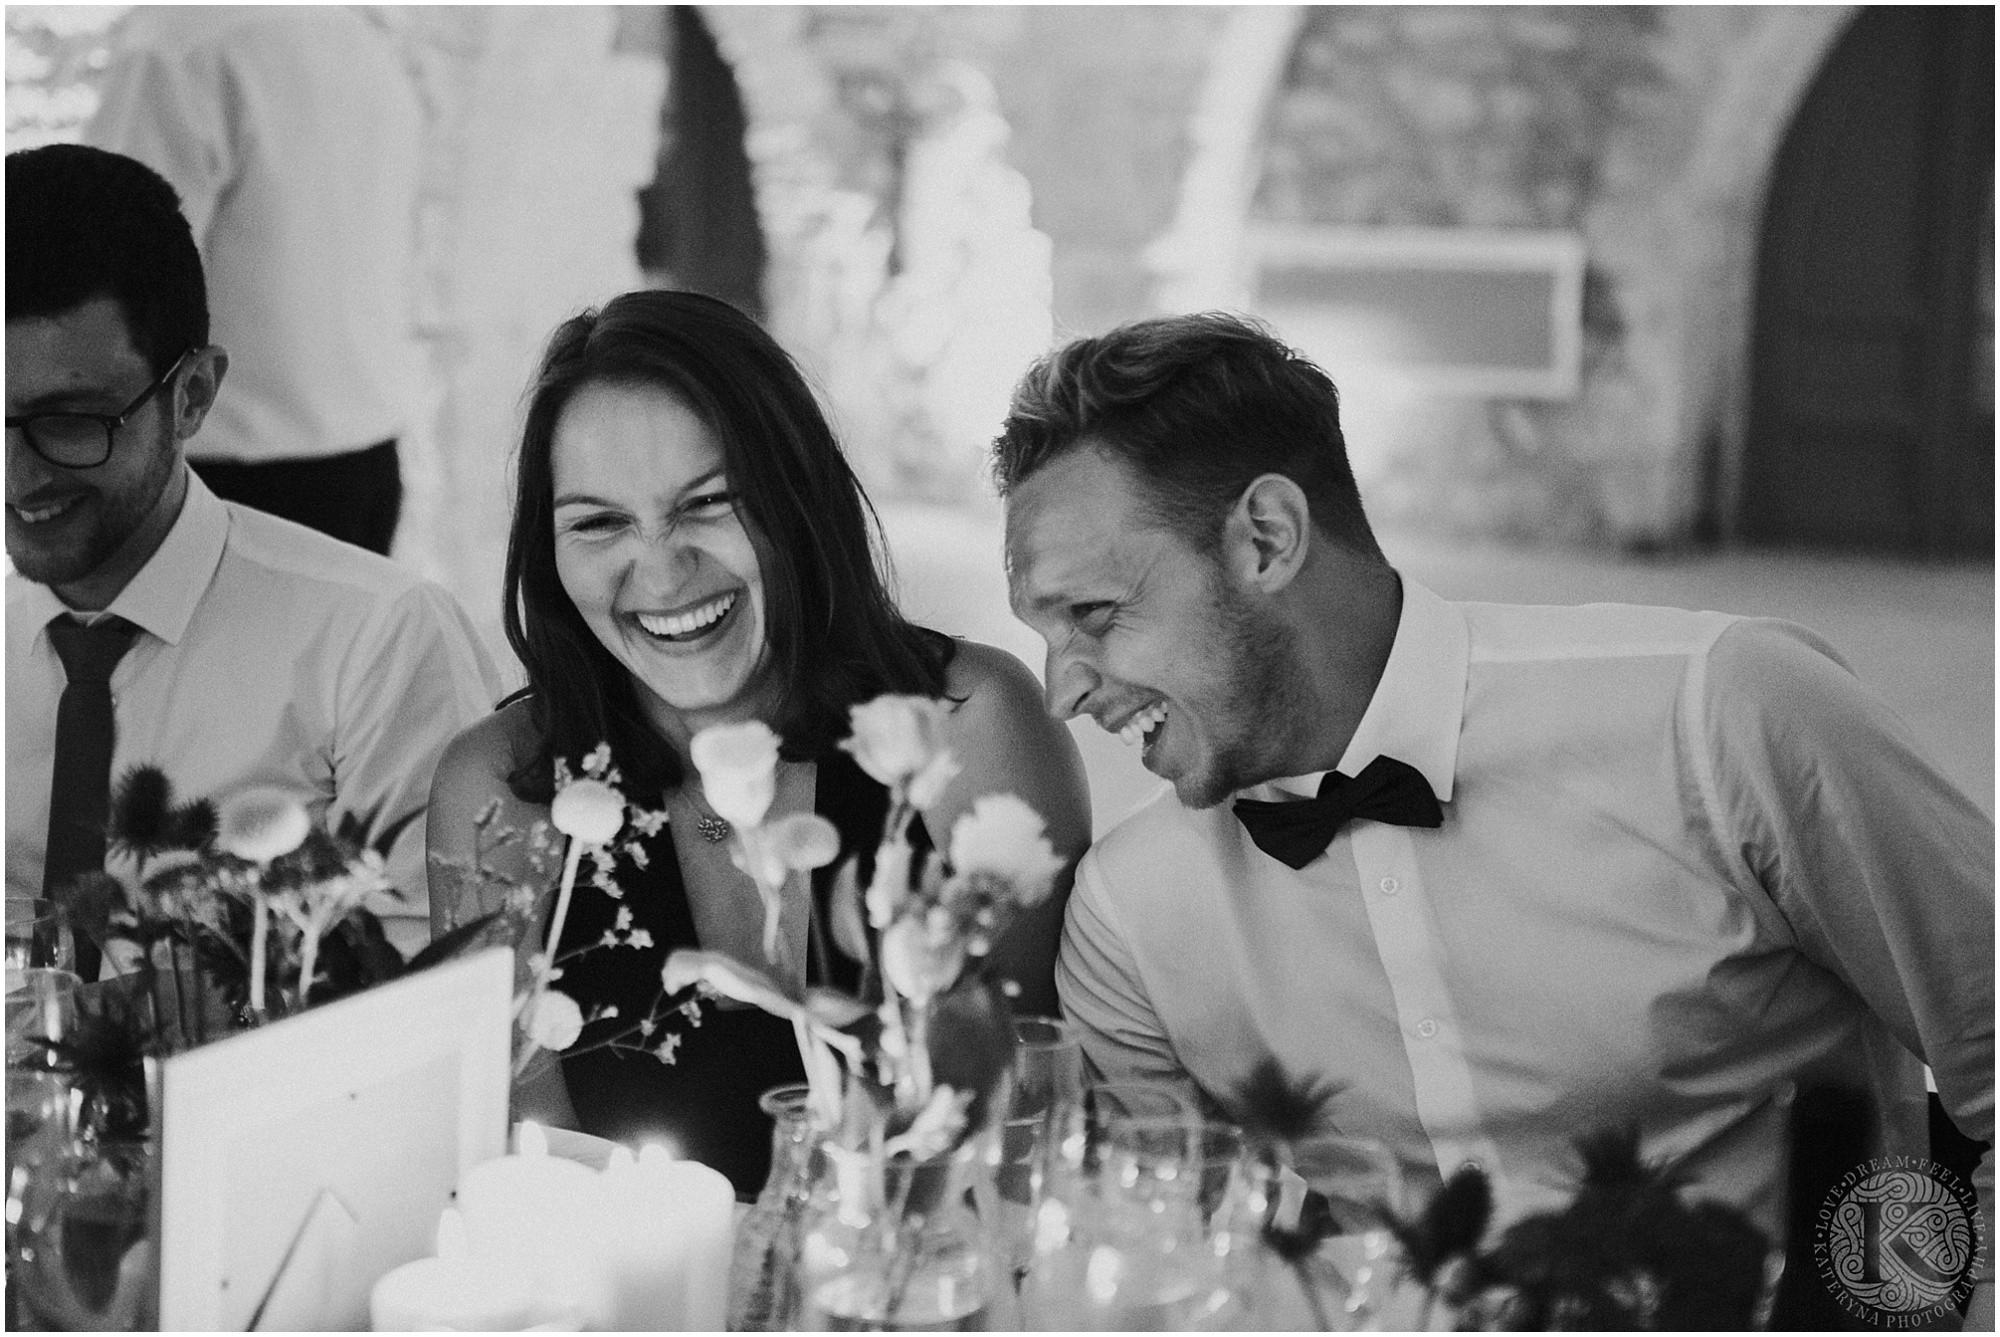 Kateryna-photos-photographe-mariage-vaucluse-provence-avignon-ferme-st-hugues_0094.jpg